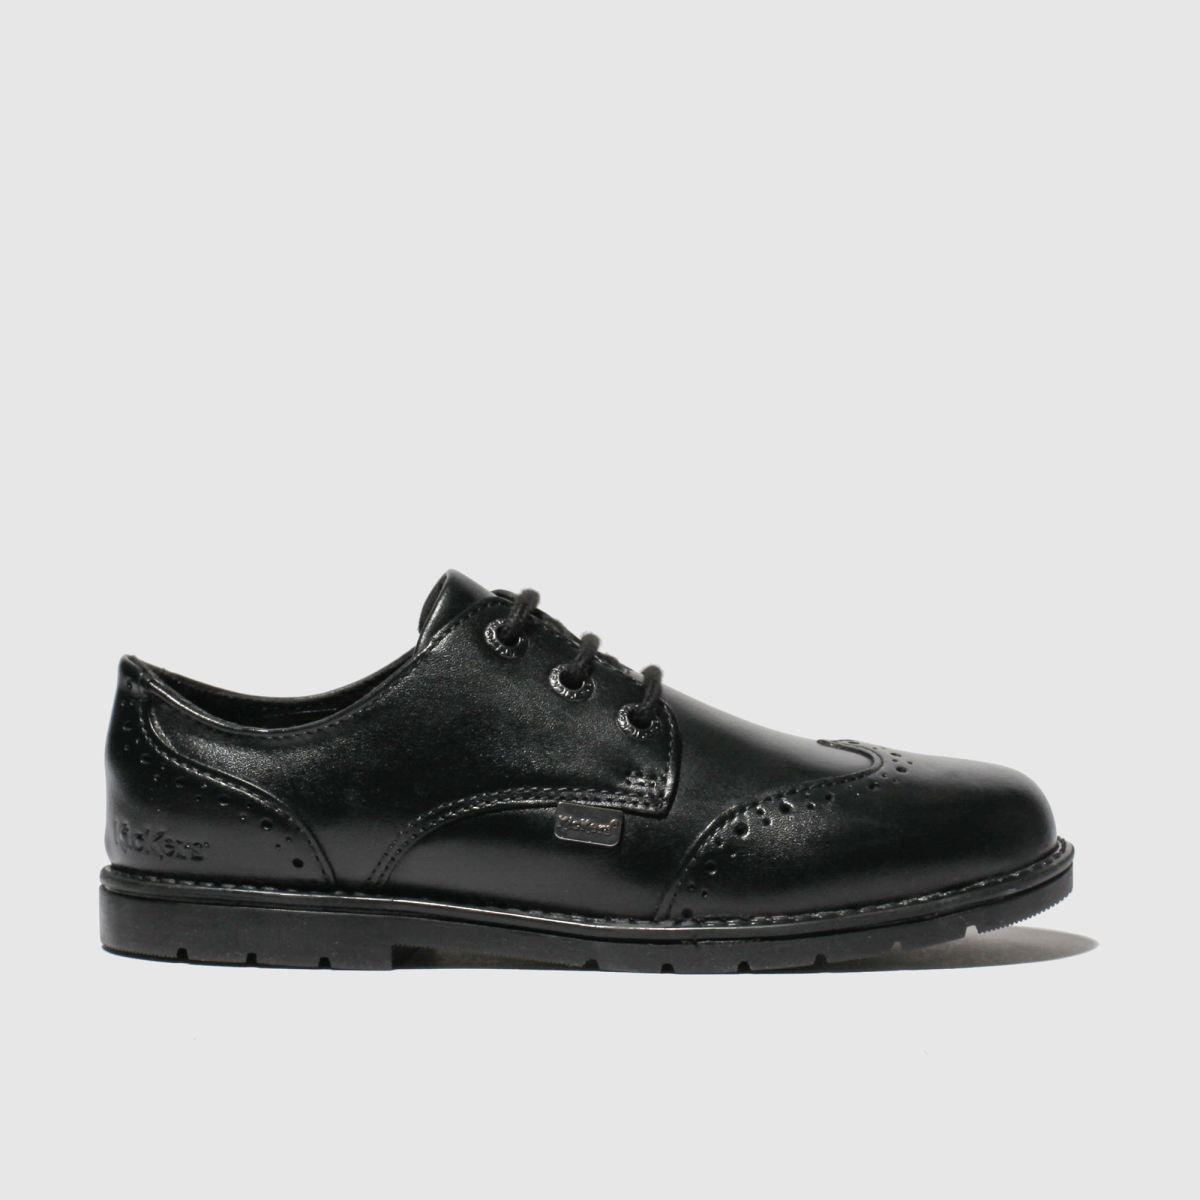 Kickers Black Orin Brogue Lo Shoes Toddler